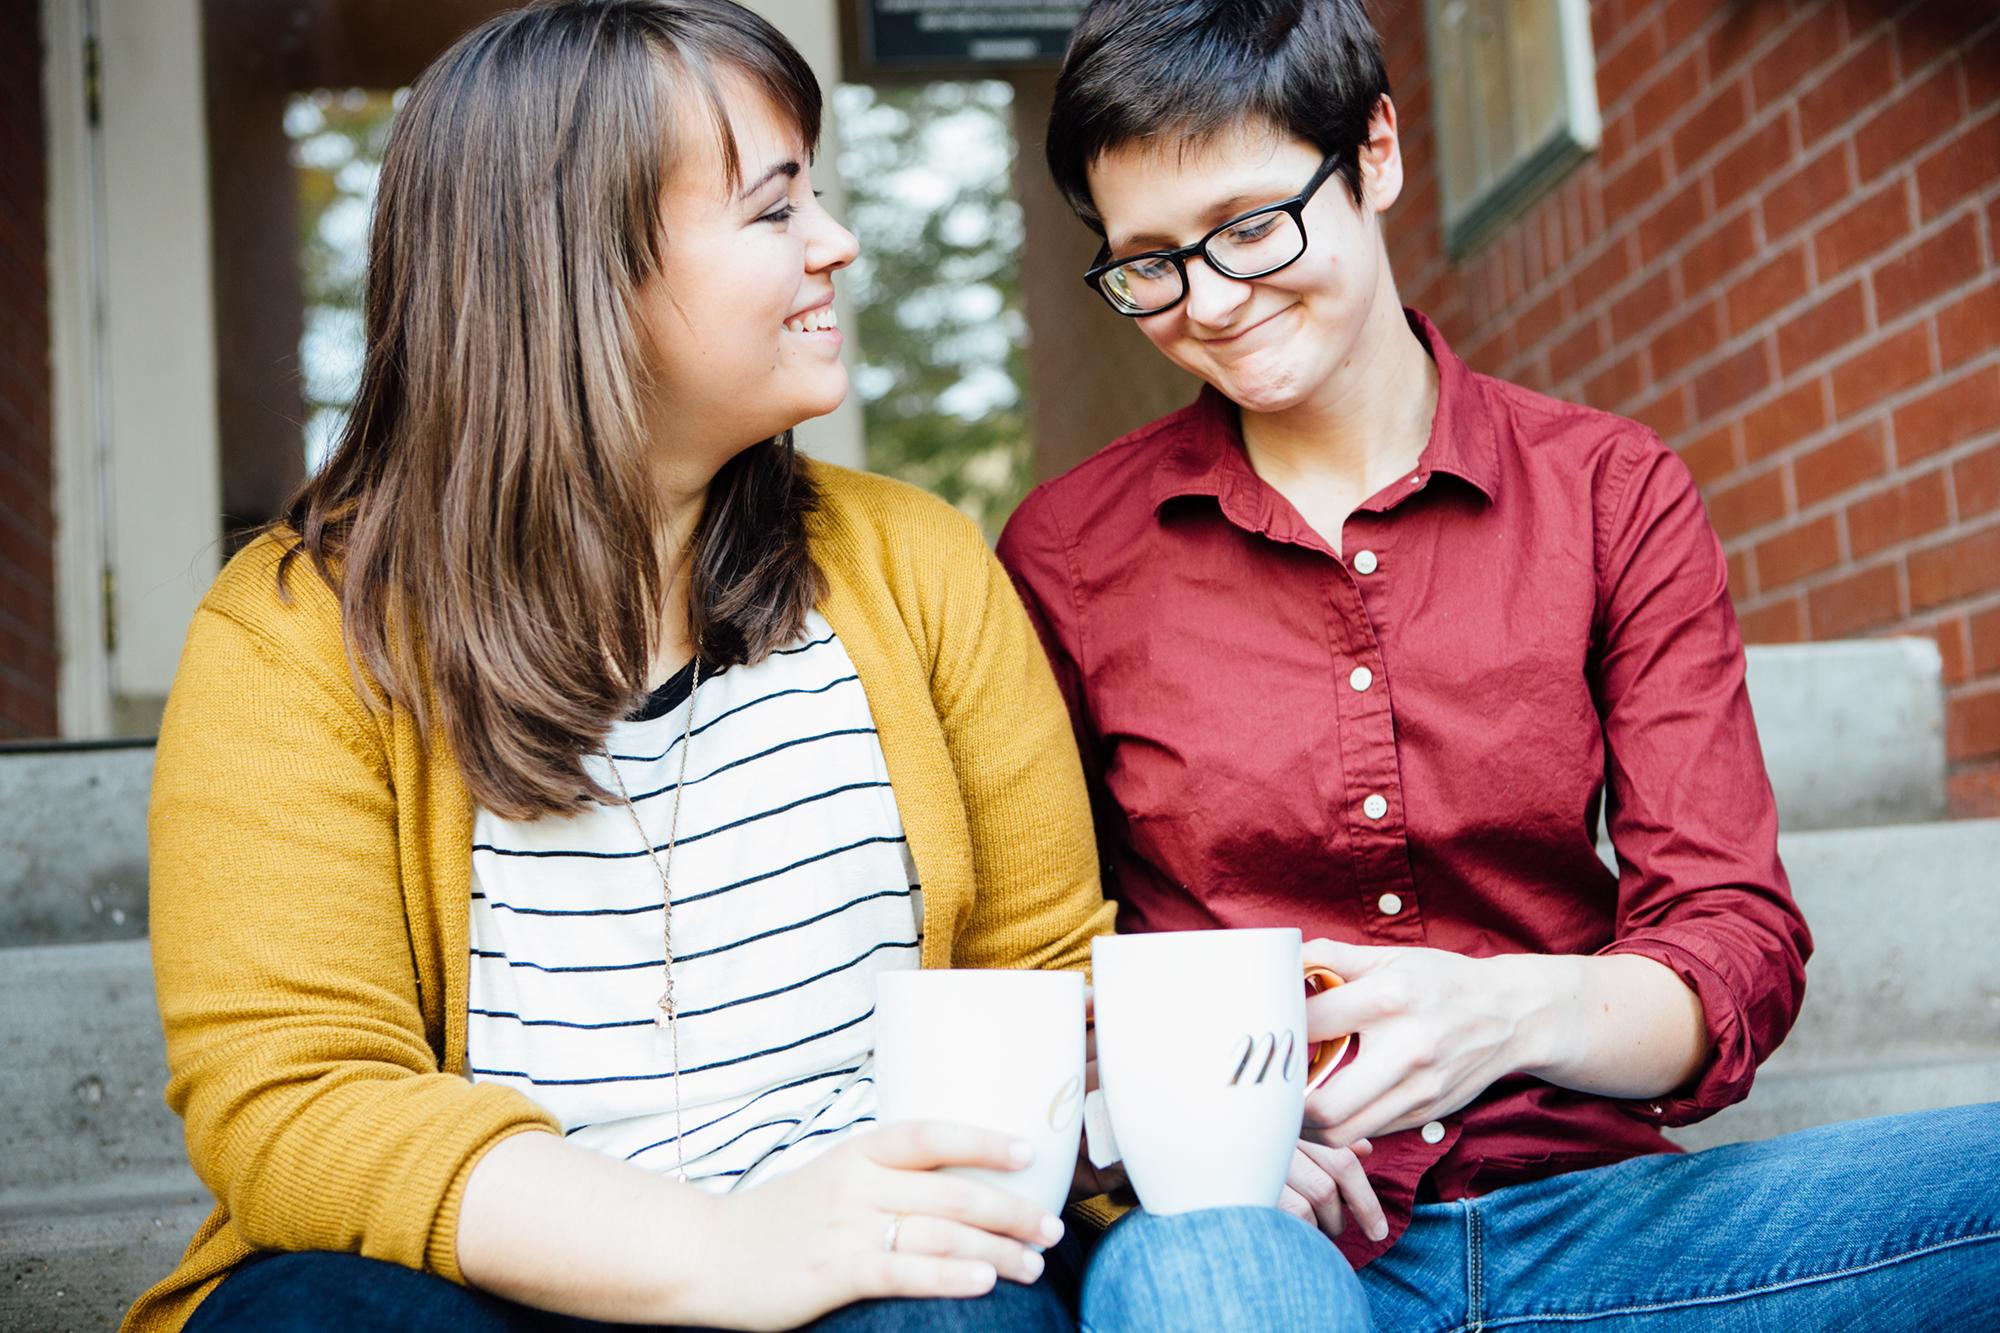 Two women clink mugs on steps outside building.